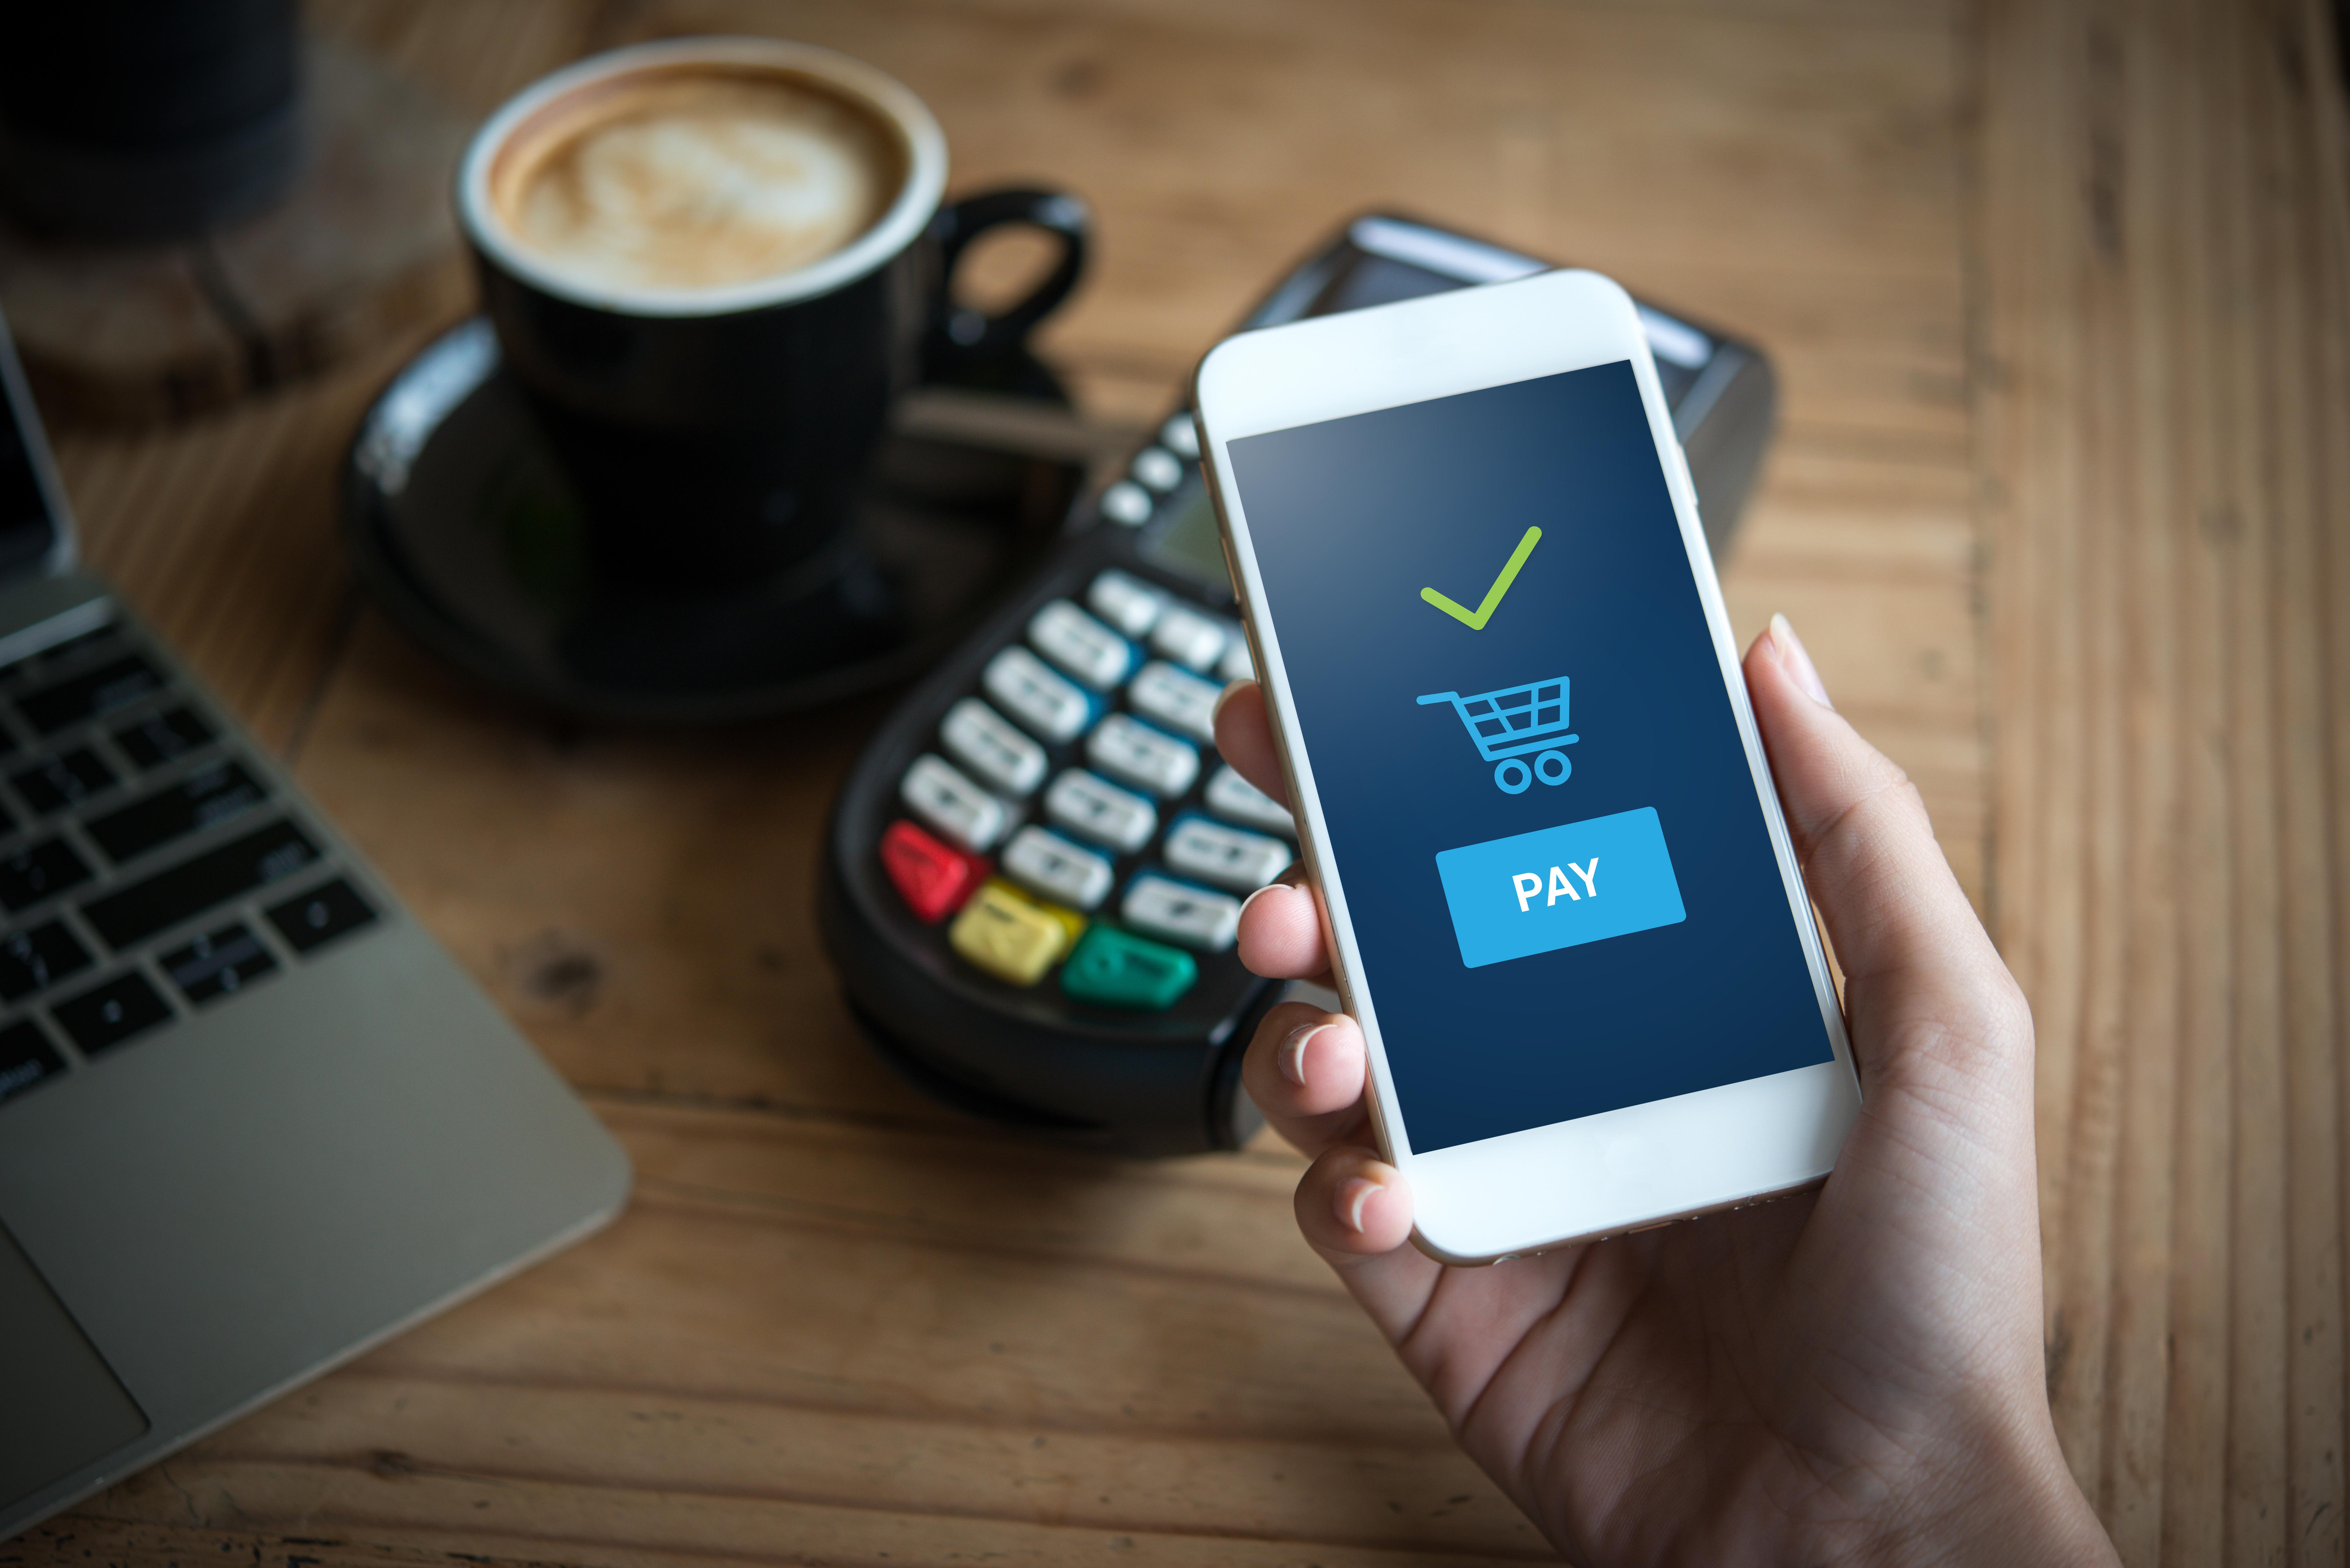 mobil betaling og teknologi